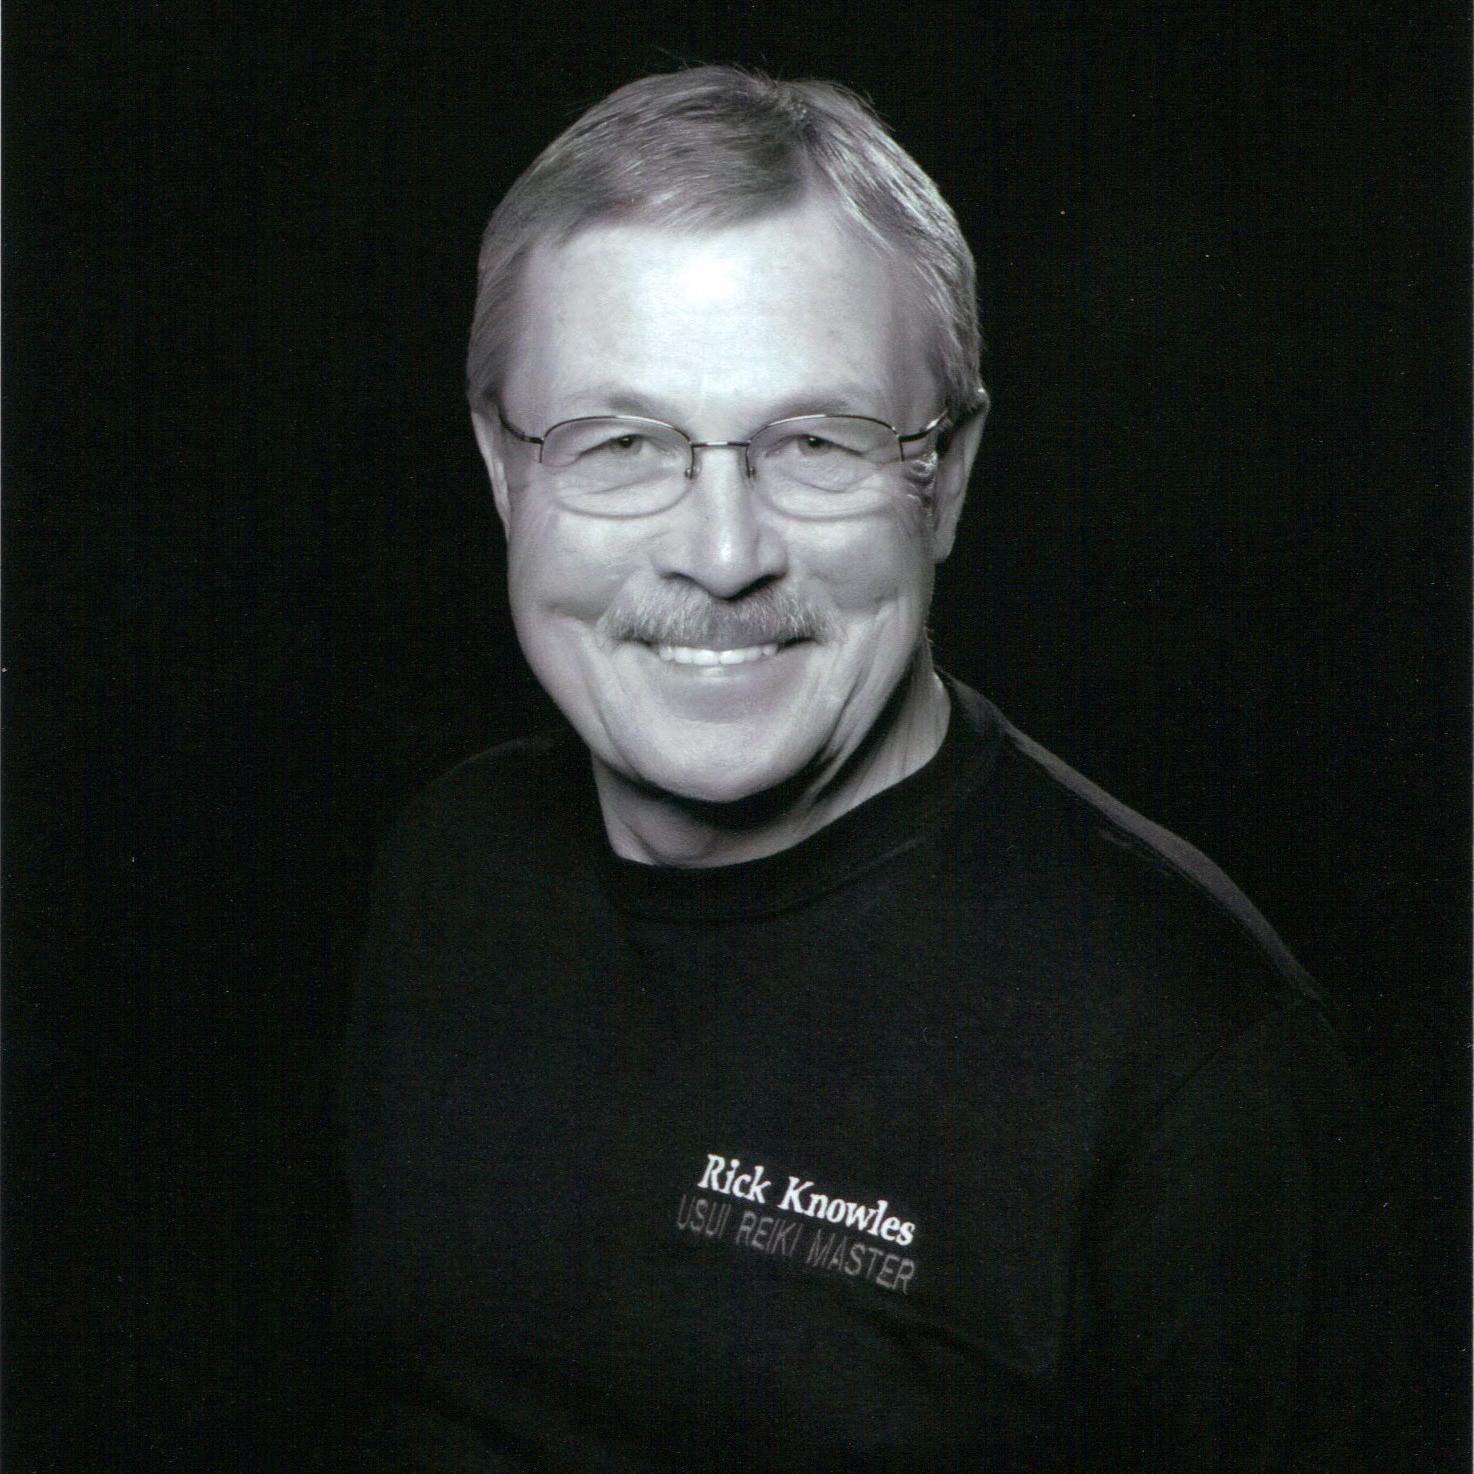 Rick Knowles